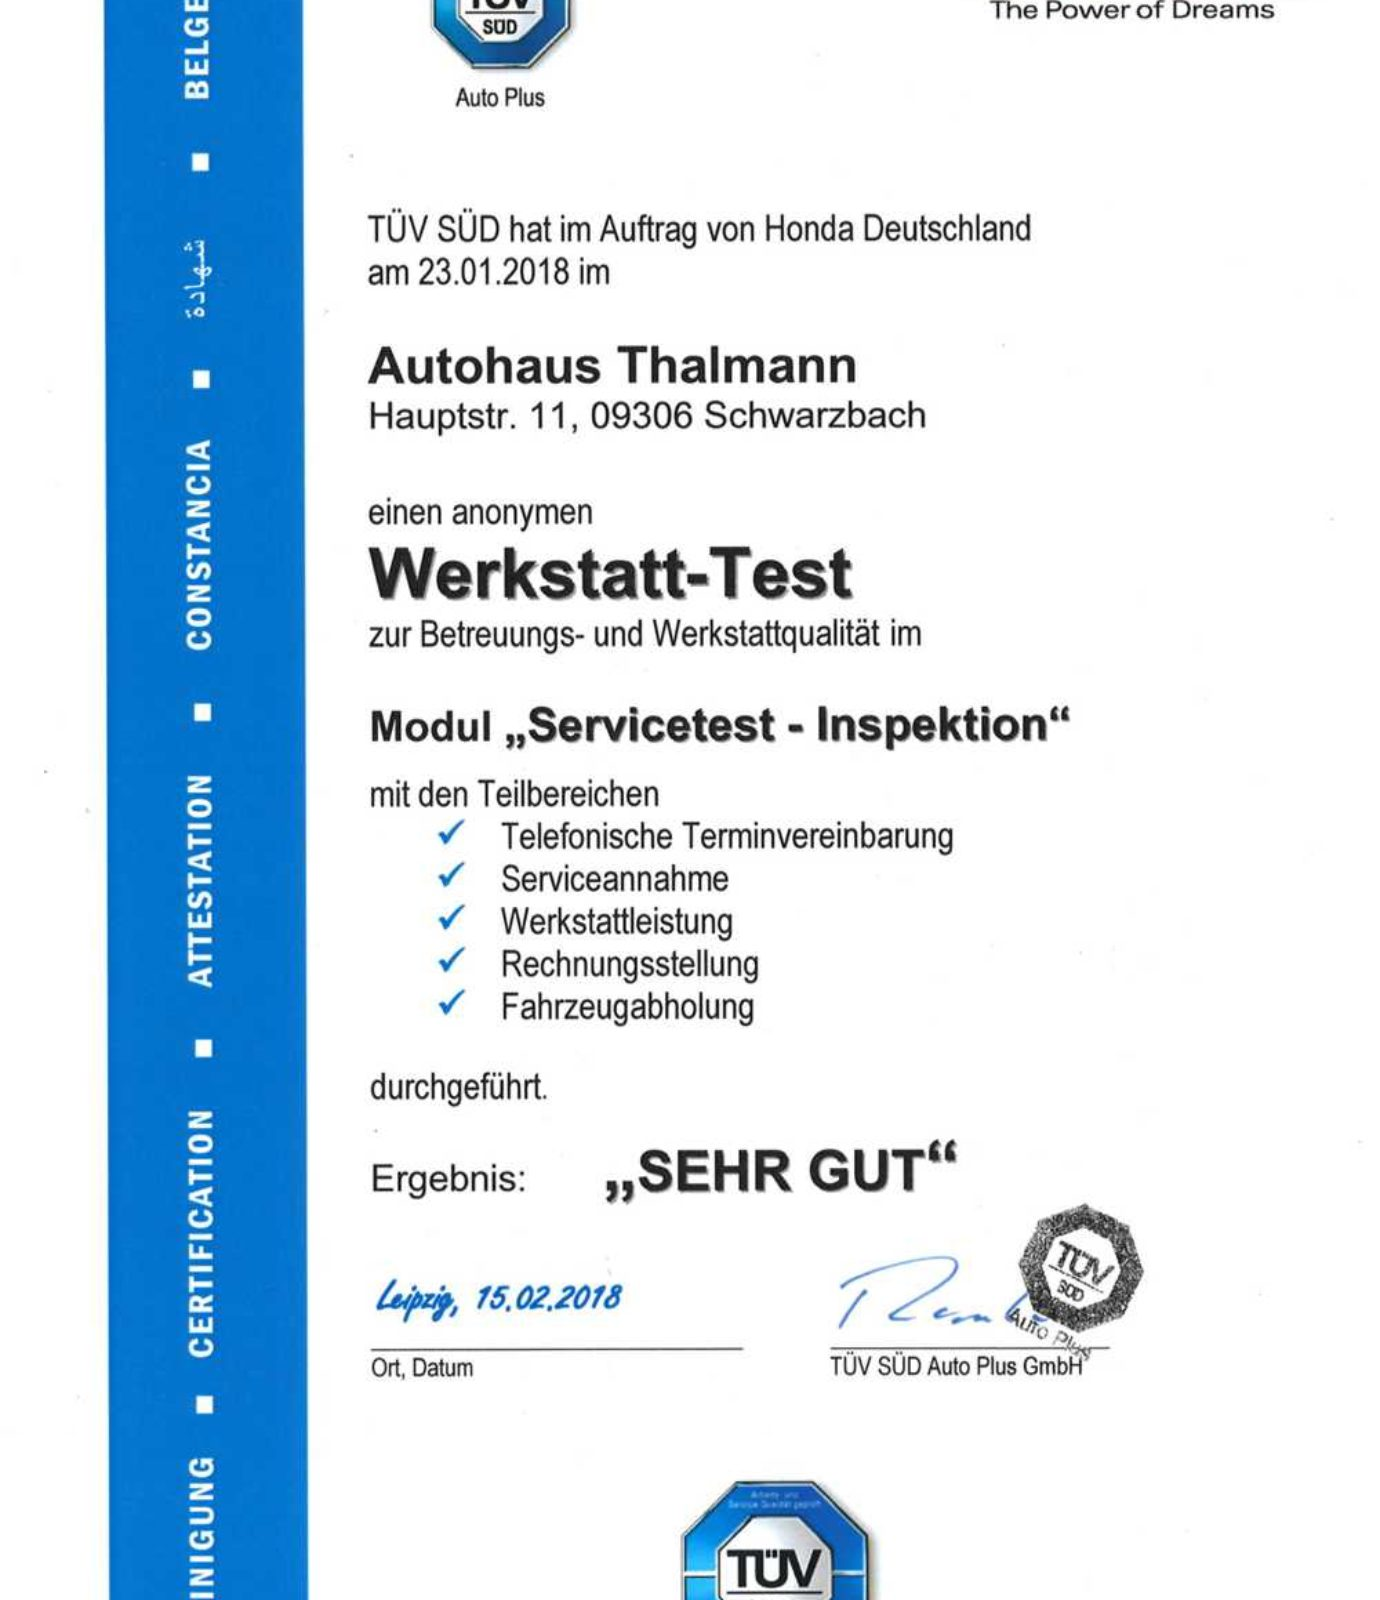 Werkstatttest_AH-Thalmann_Honda